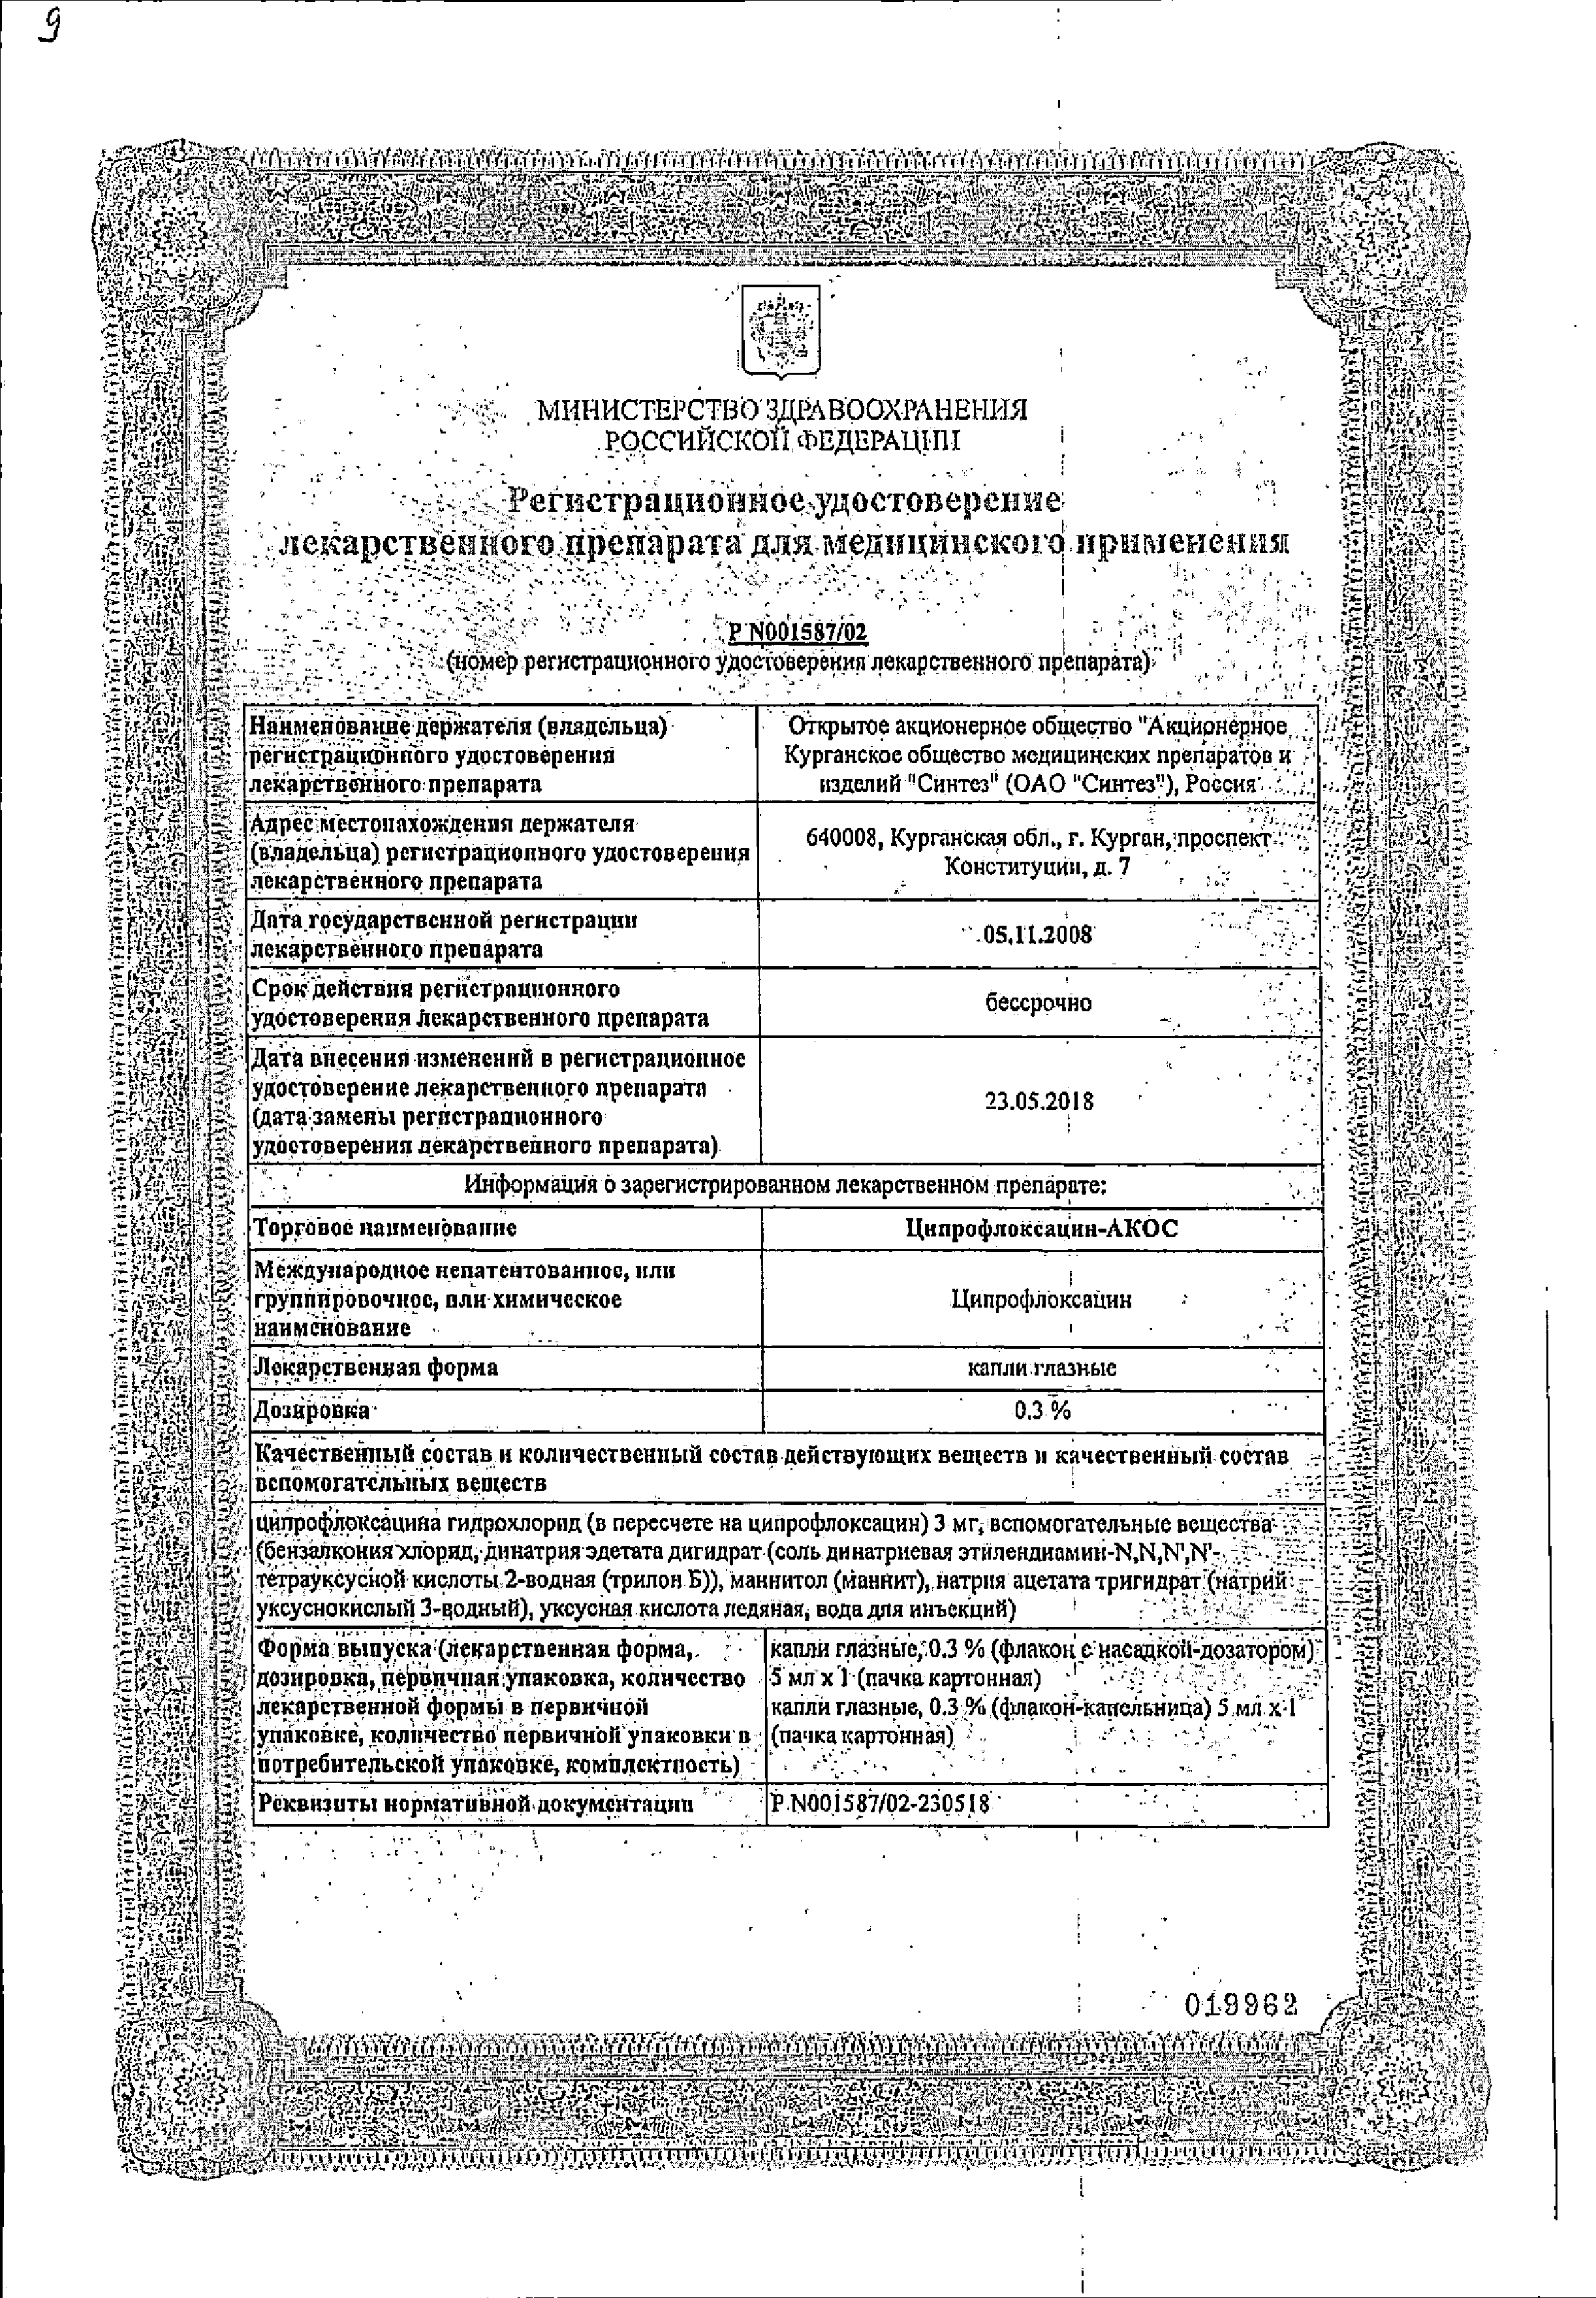 Ципрофлоксацин-АКОС сертификат